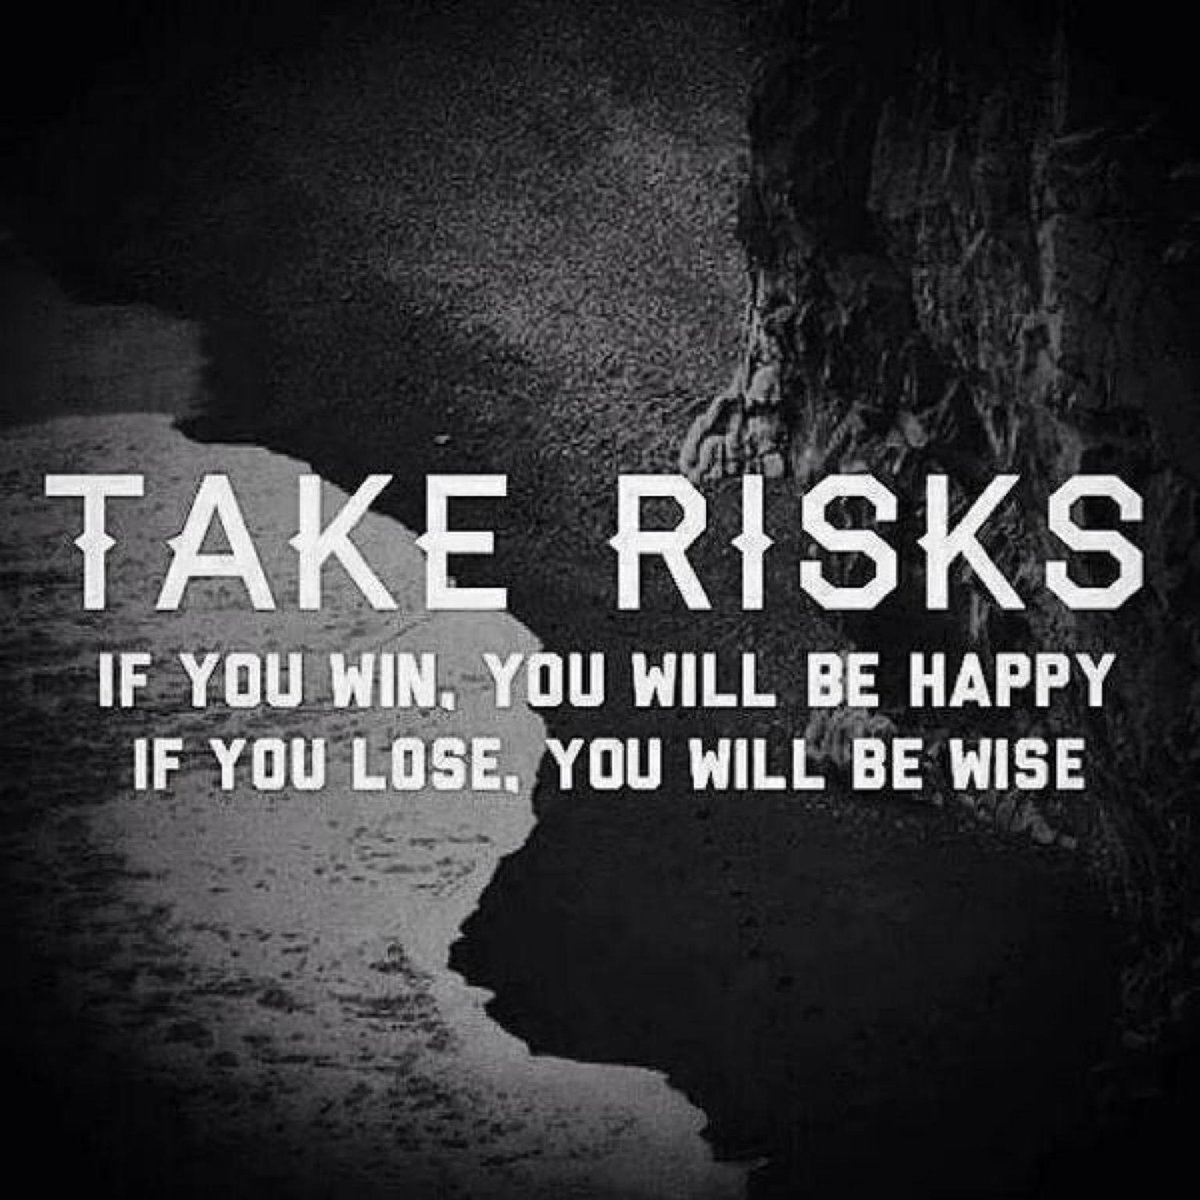 #txeduchat Take risks. http://t.co/USS35WnhfN